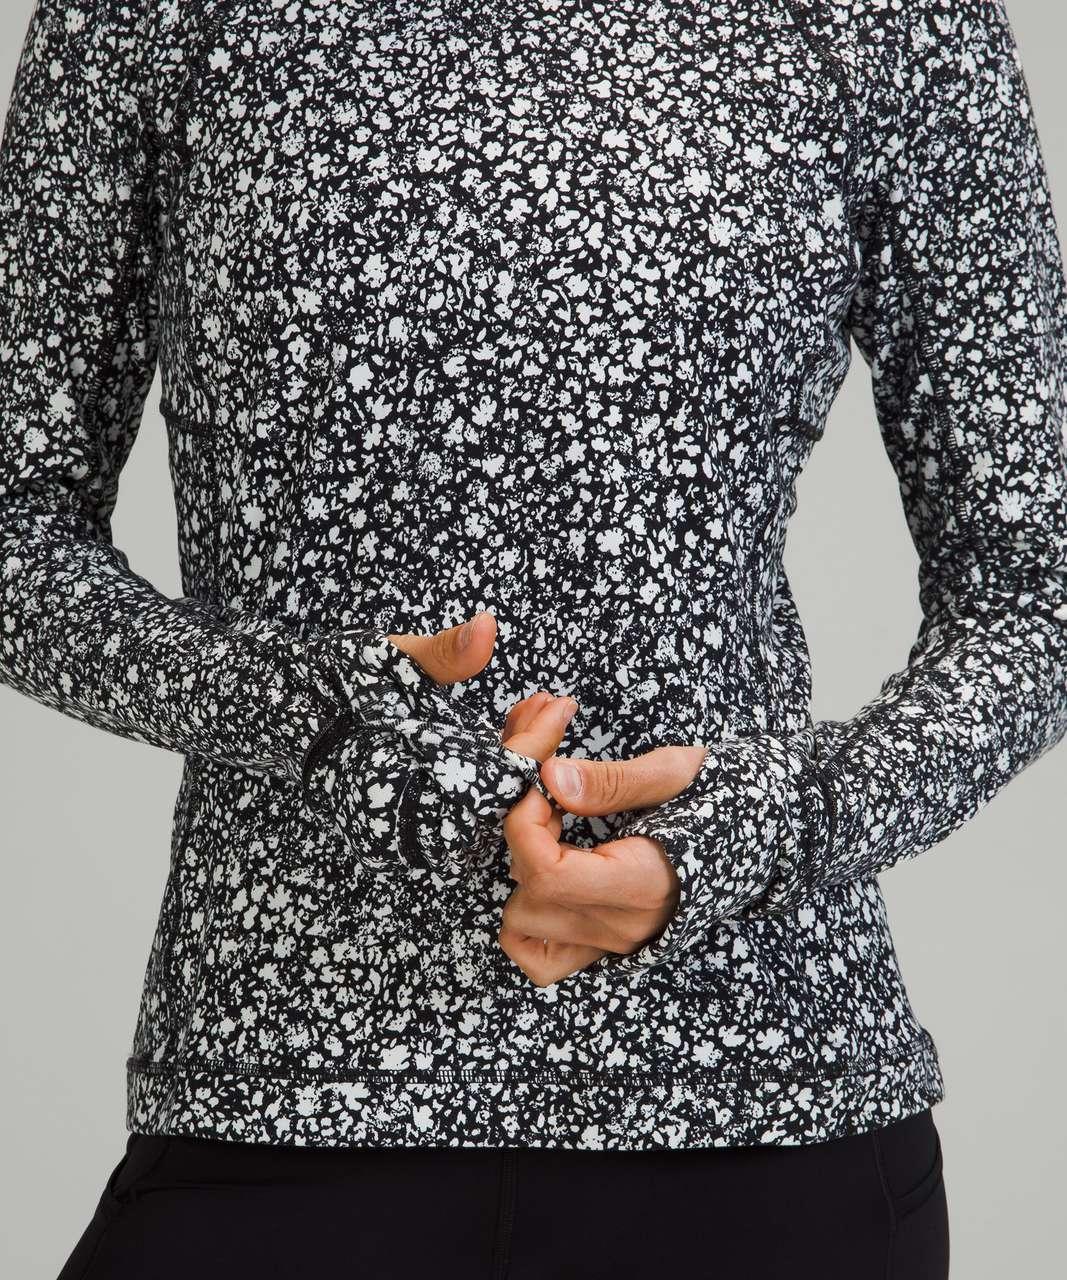 Lululemon Its Rulu Run Long Sleeve Shirt - Venture Floral Alpine White Black